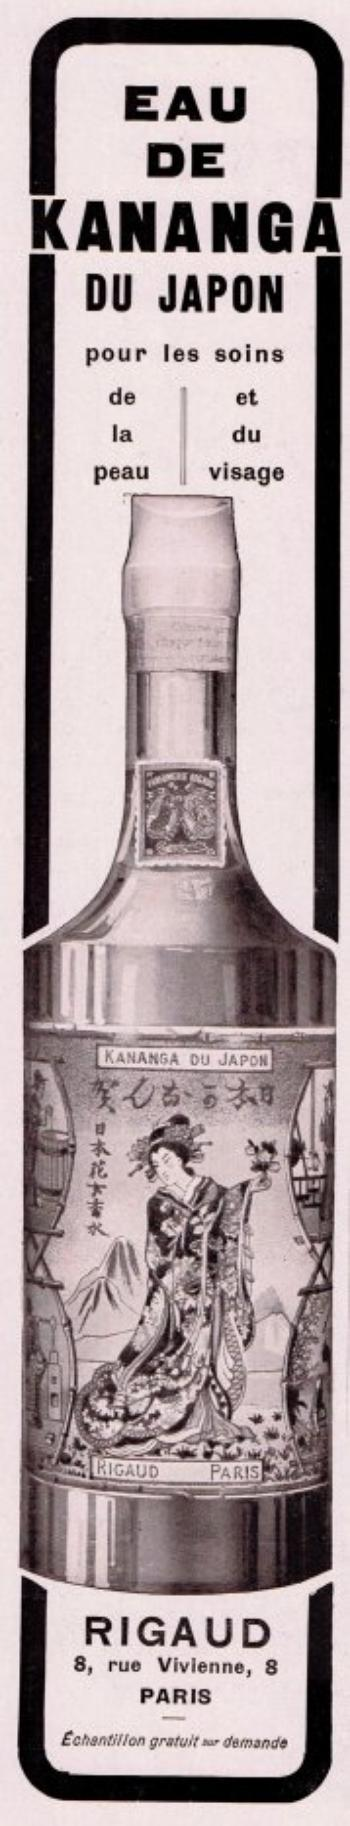 🌸 Rigaud ✿ Eau de Kananga du Japon 🌸